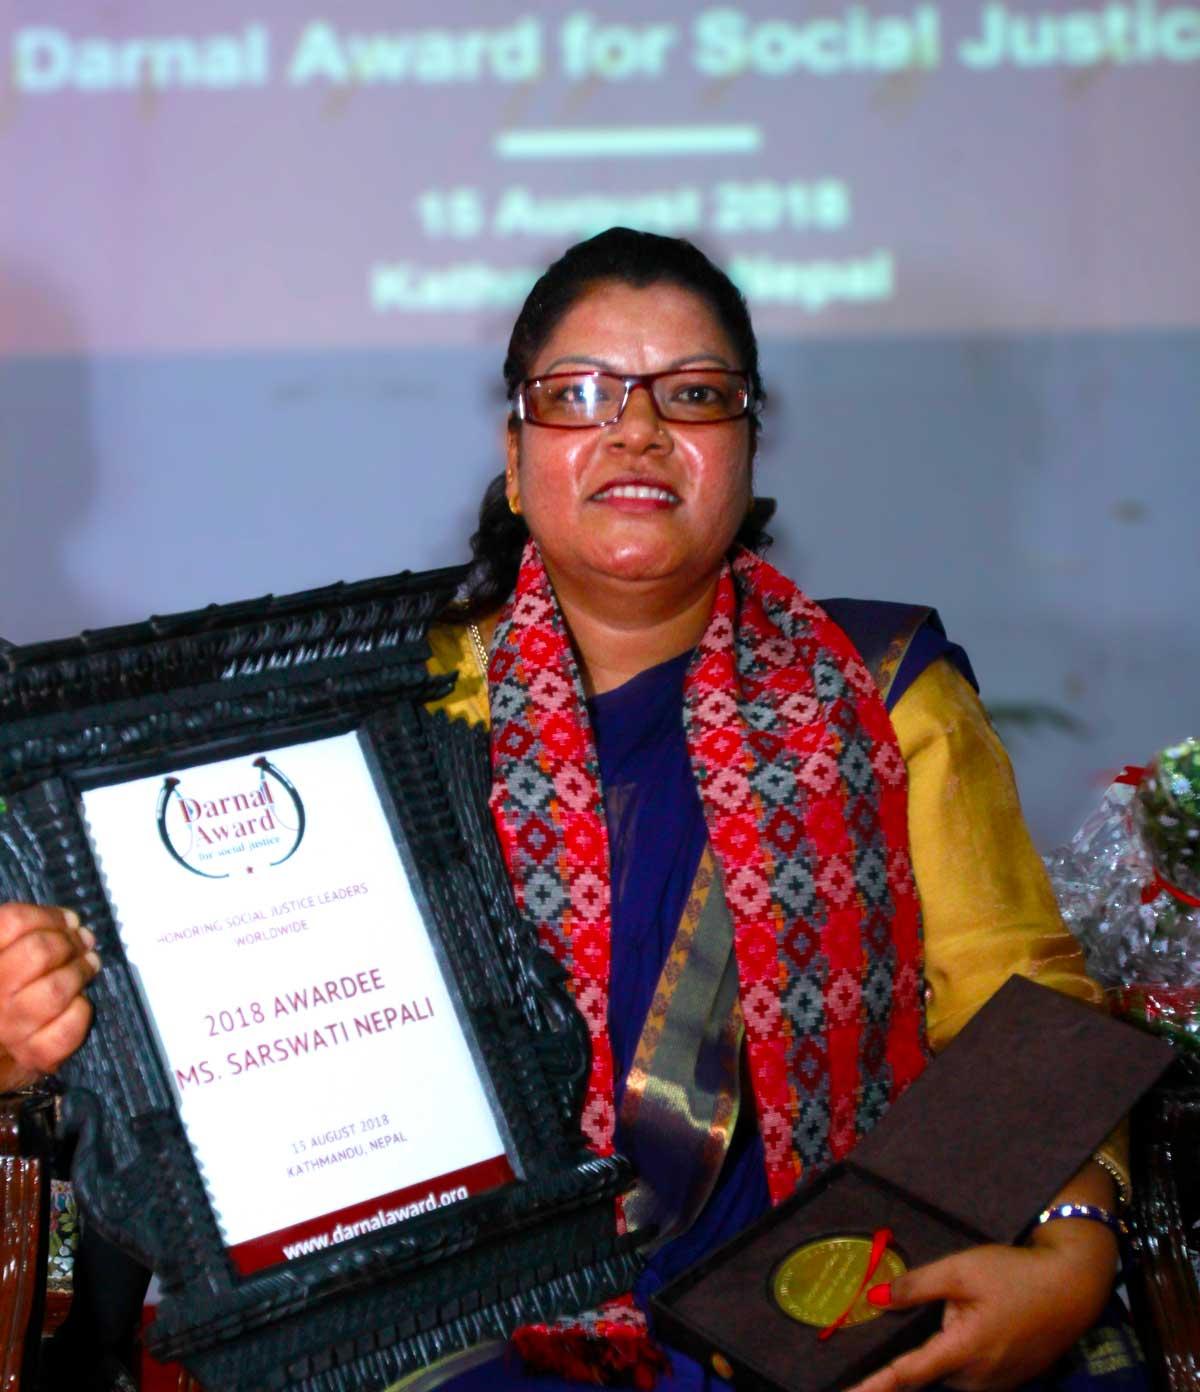 Saraswati Nepali